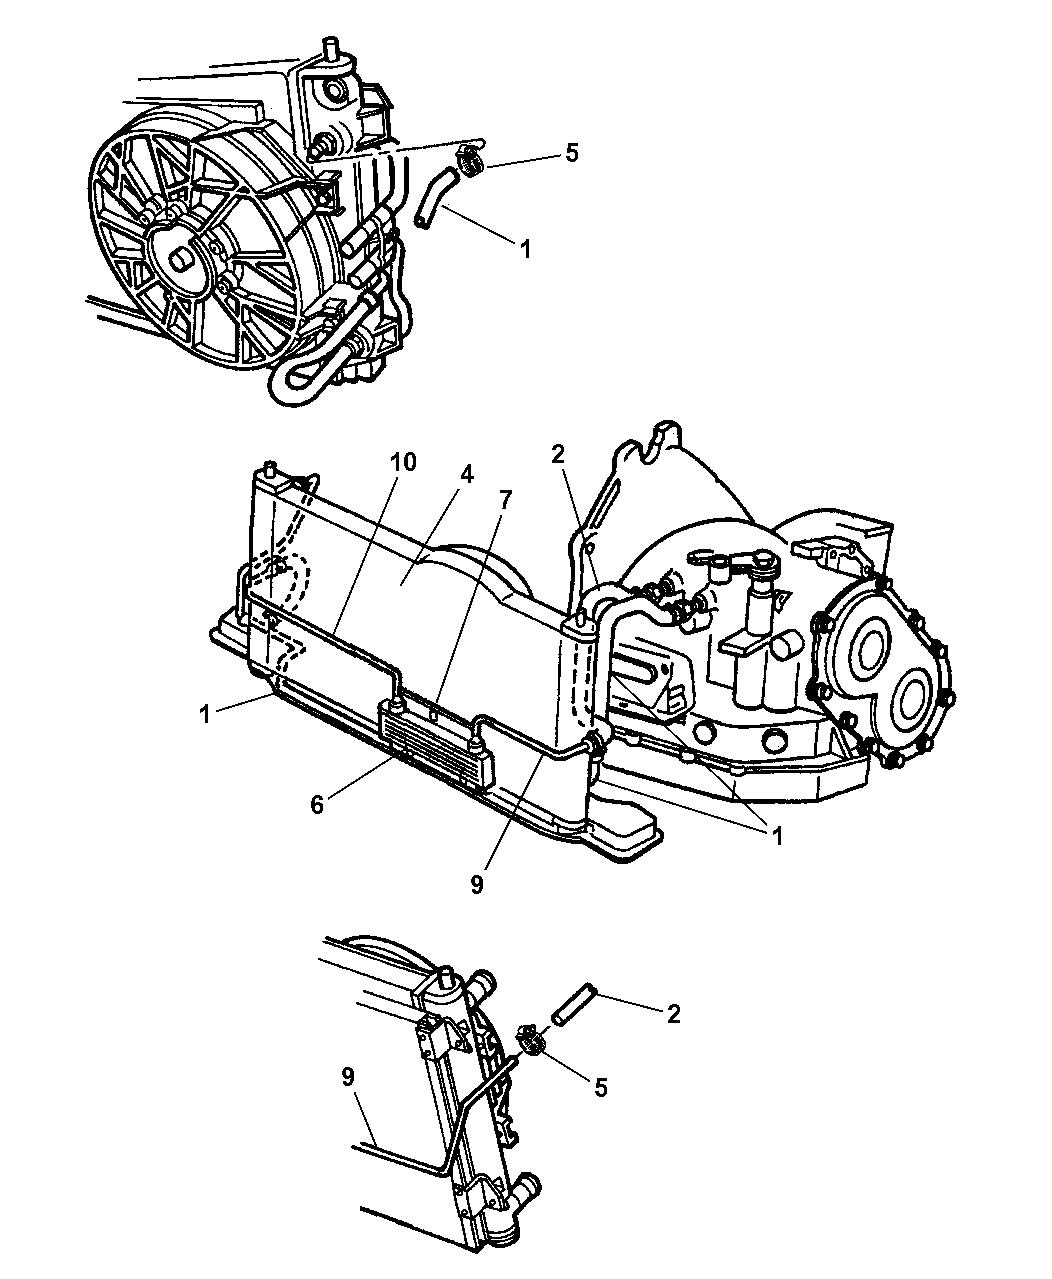 2000 chrysler sebring convertible transmission oil cooler